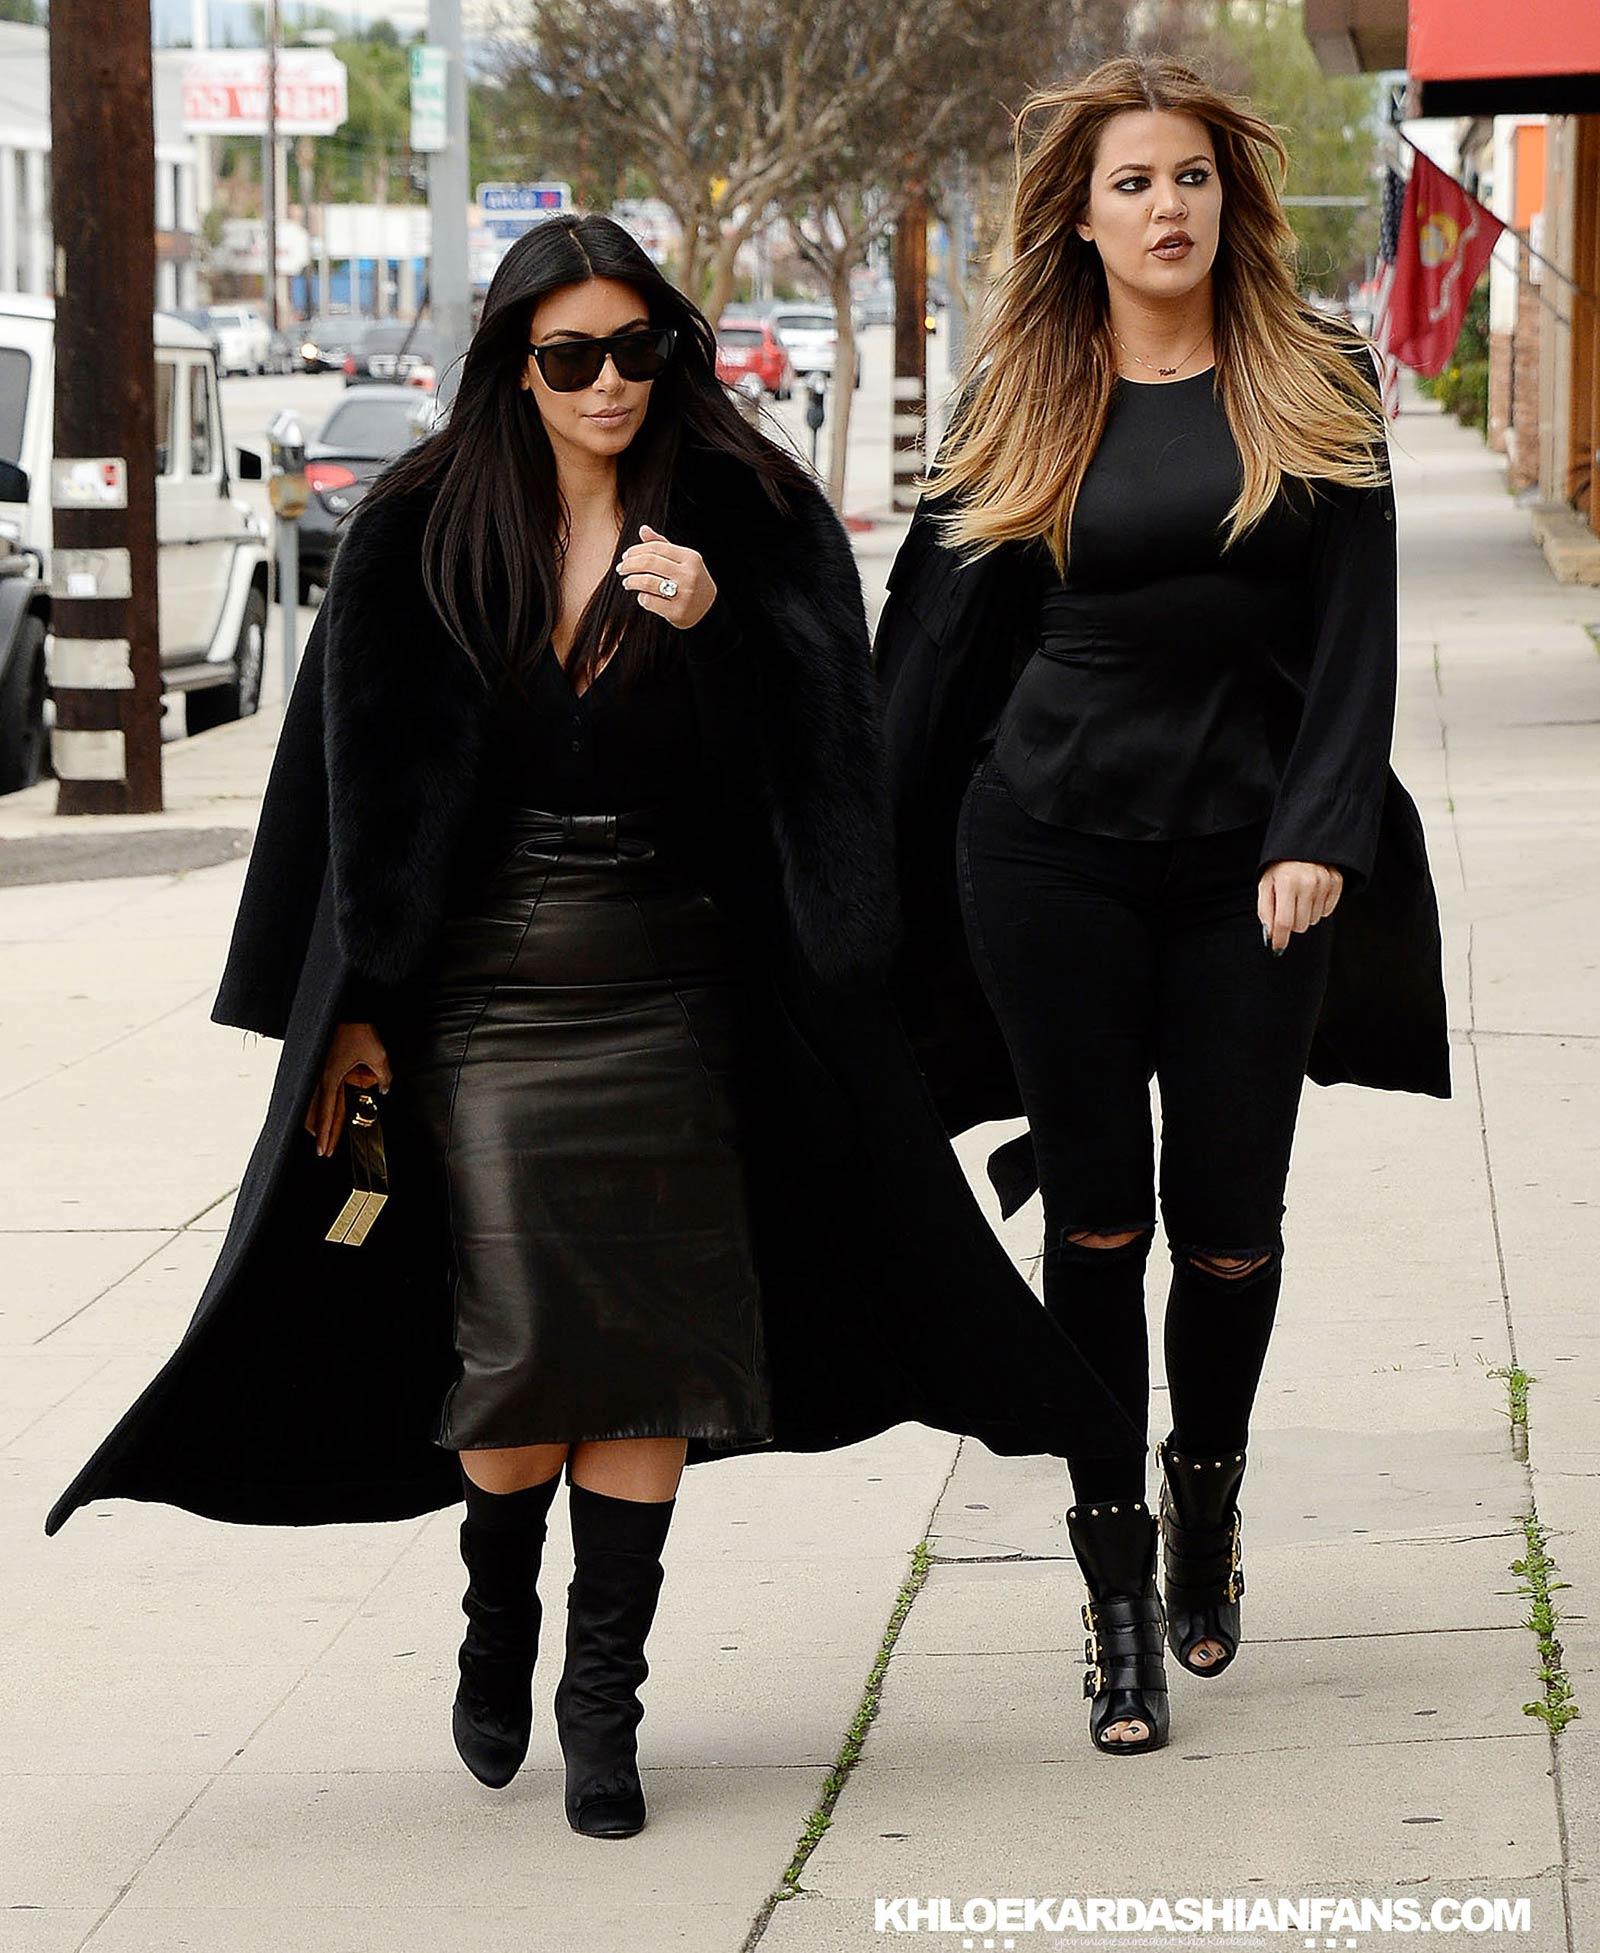 Kim & Khloe Kardashian arriving at Jenner Communications